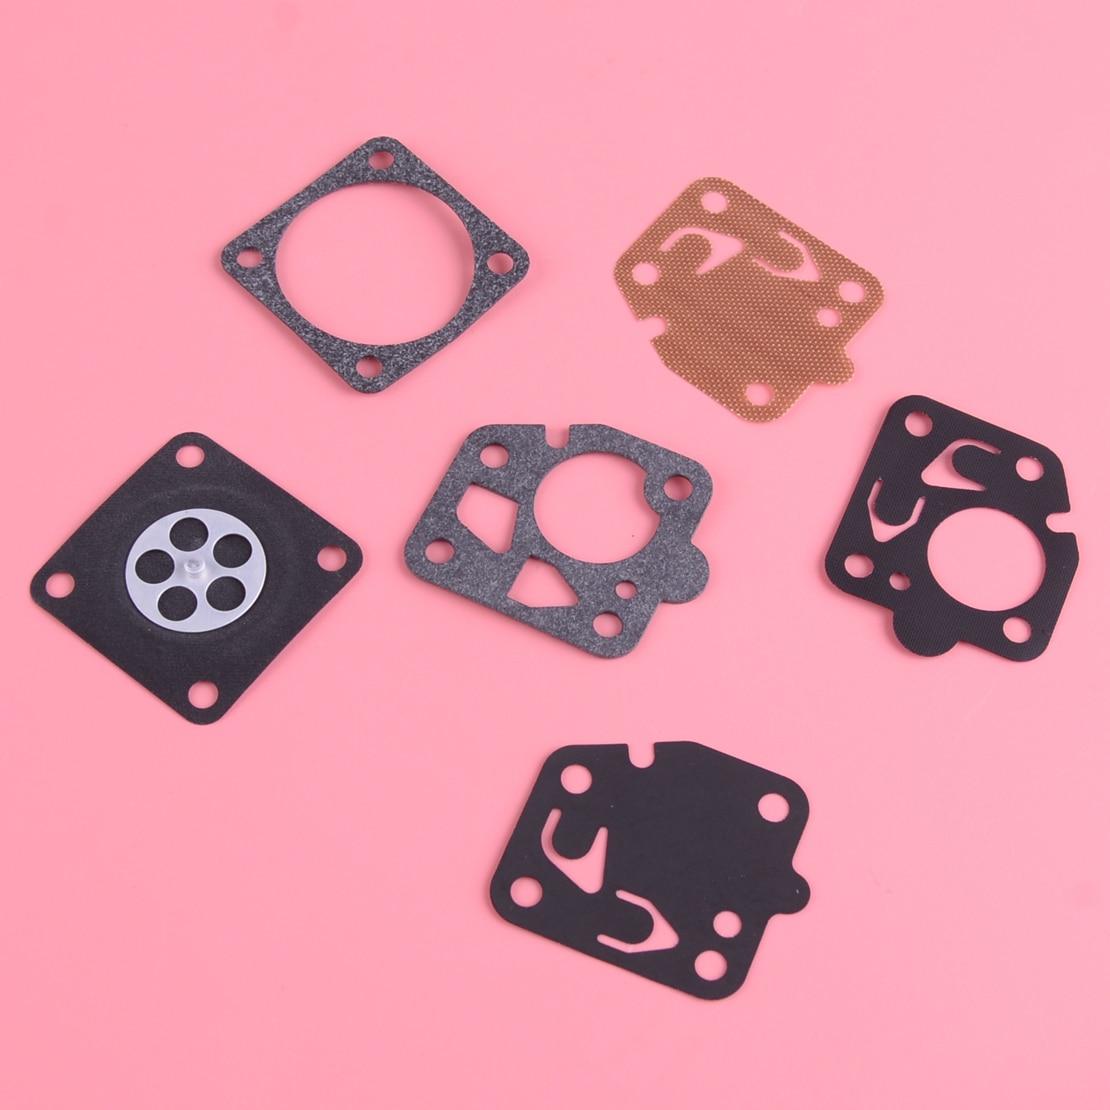 LETAOSK Carburetor Carb Gasket Repair Rebuild Kit Fit For Kawasaki TG18 TG20 TG24 TG28 TG33 TF22 Engine Tool Part Replacement